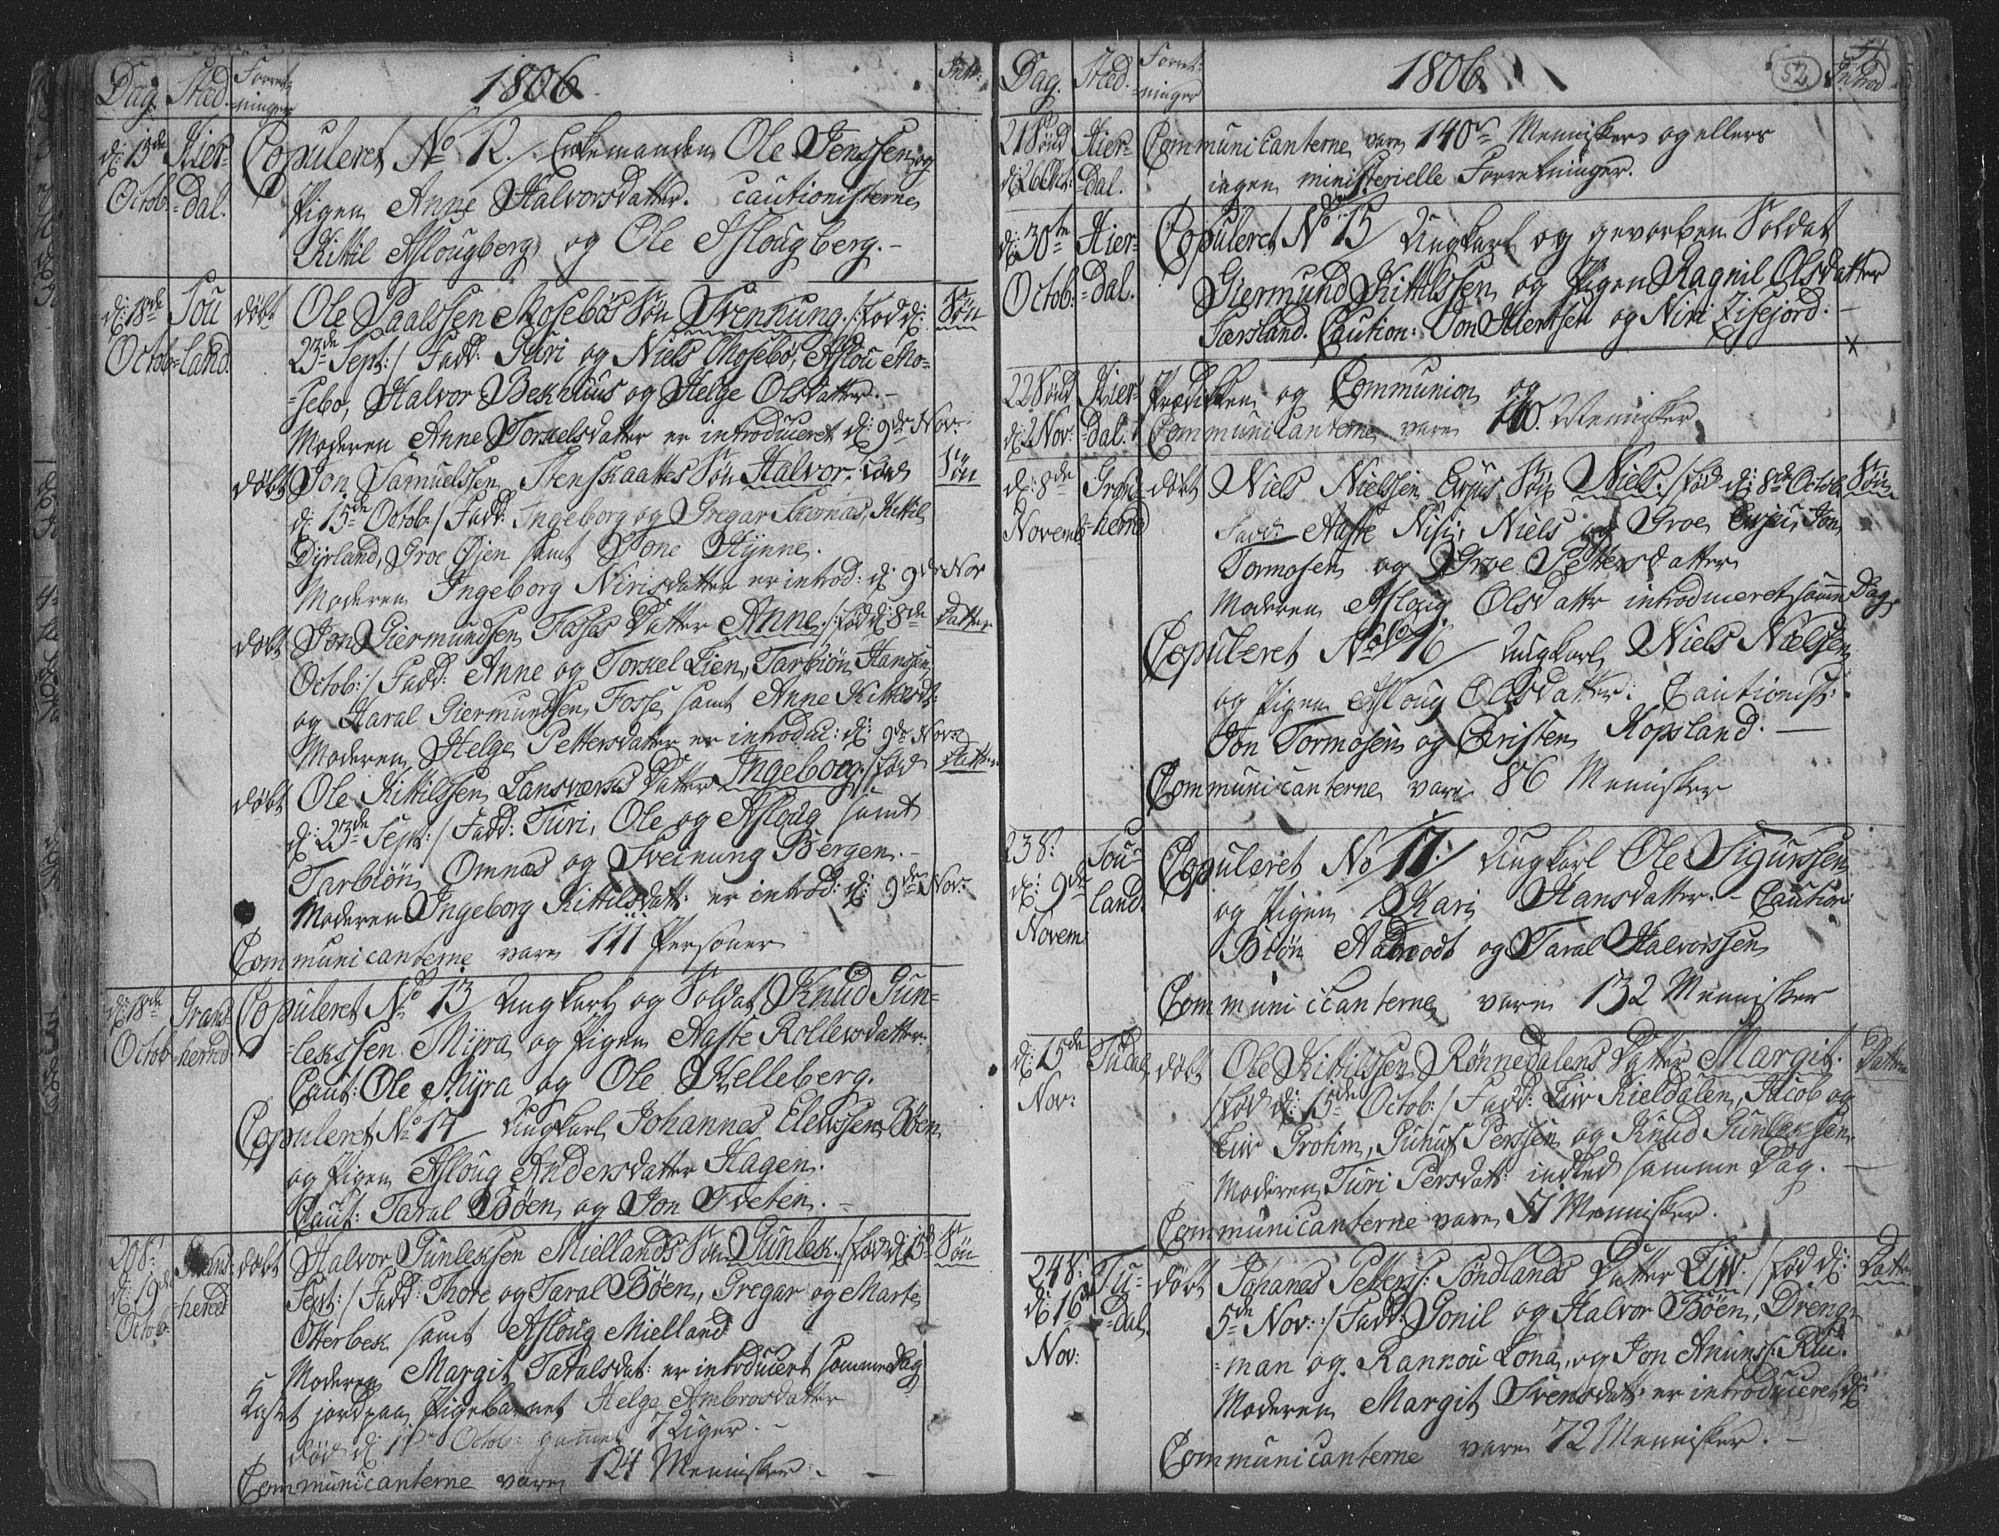 SAKO, Hjartdal kirkebøker, F/Fa/L0006: Ministerialbok nr. I 6, 1801-1814, s. 52